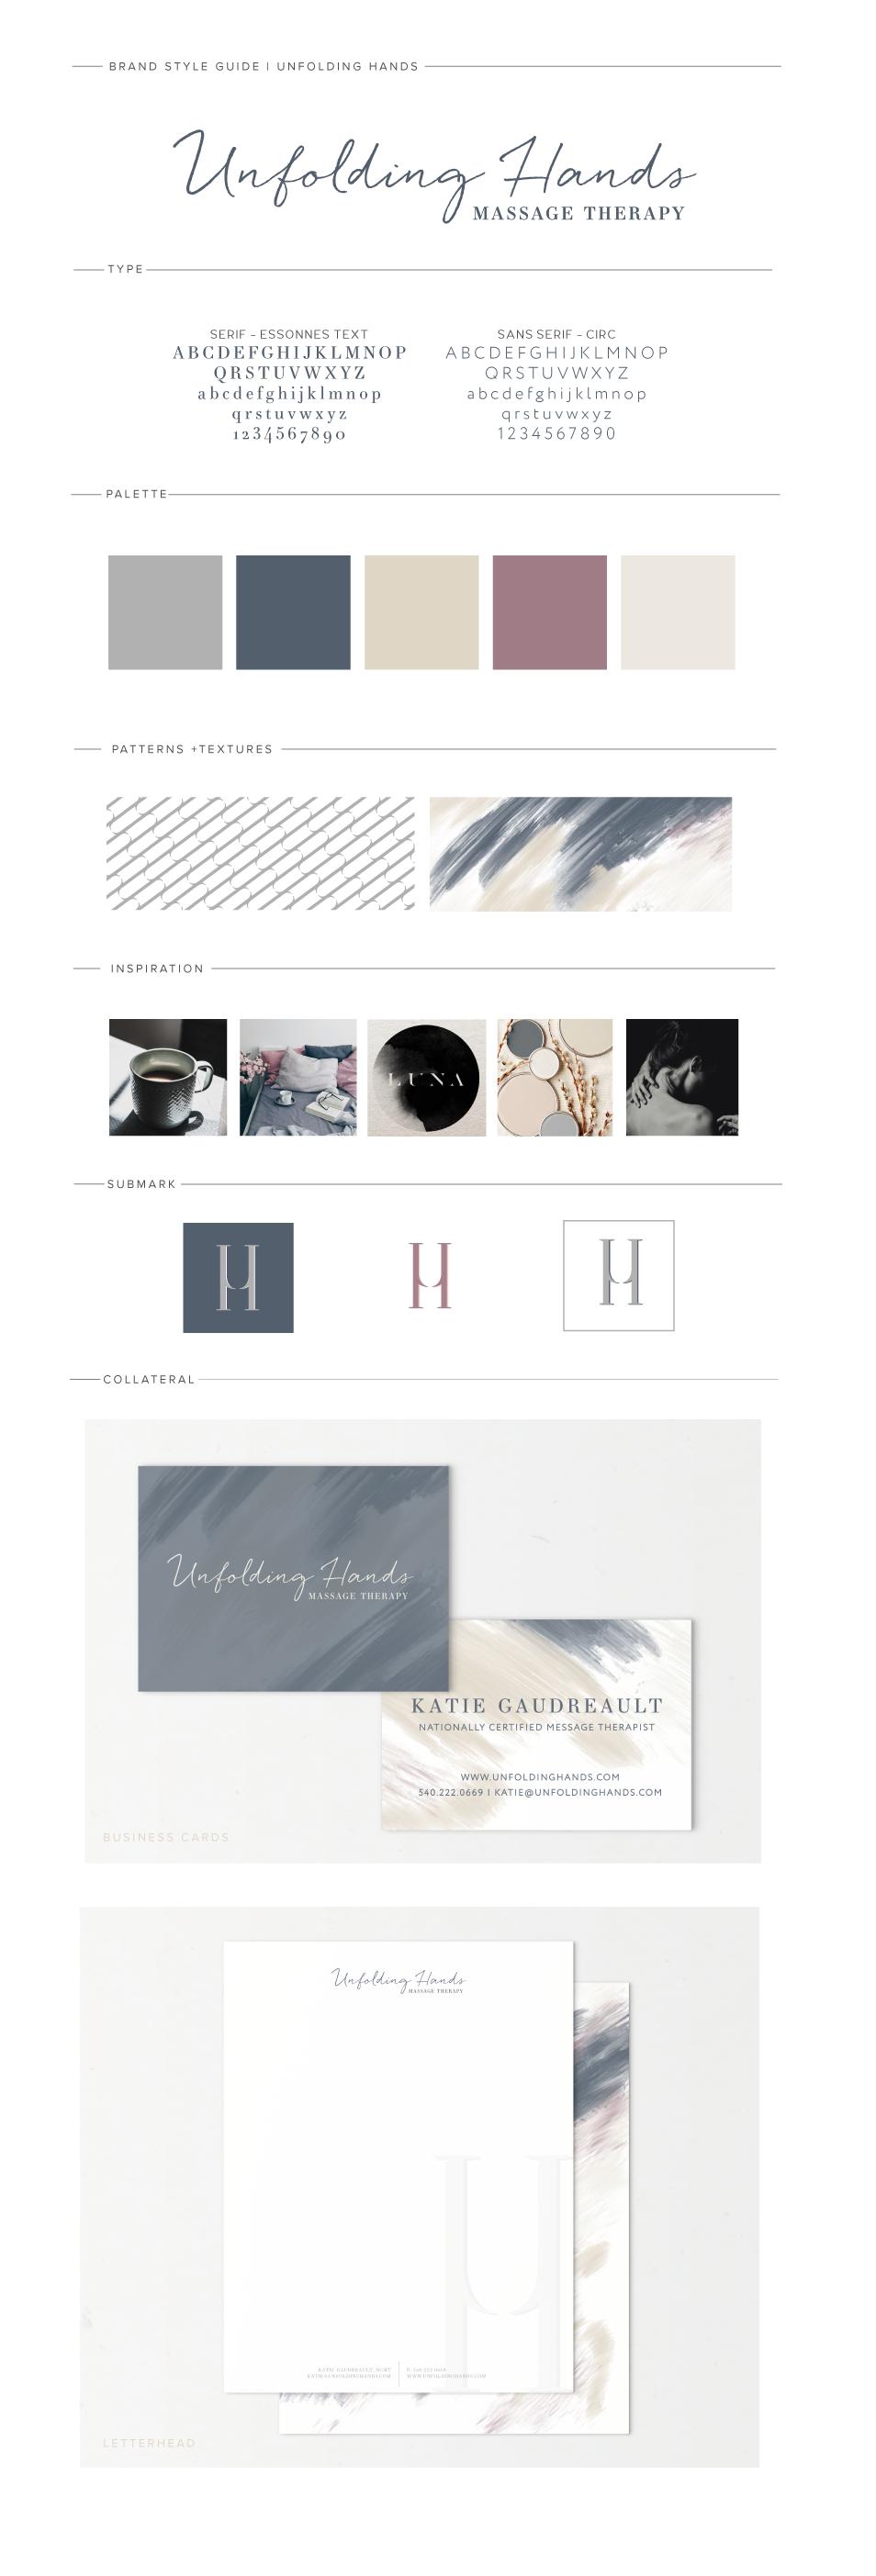 Unfolding-Hands-Branding.png